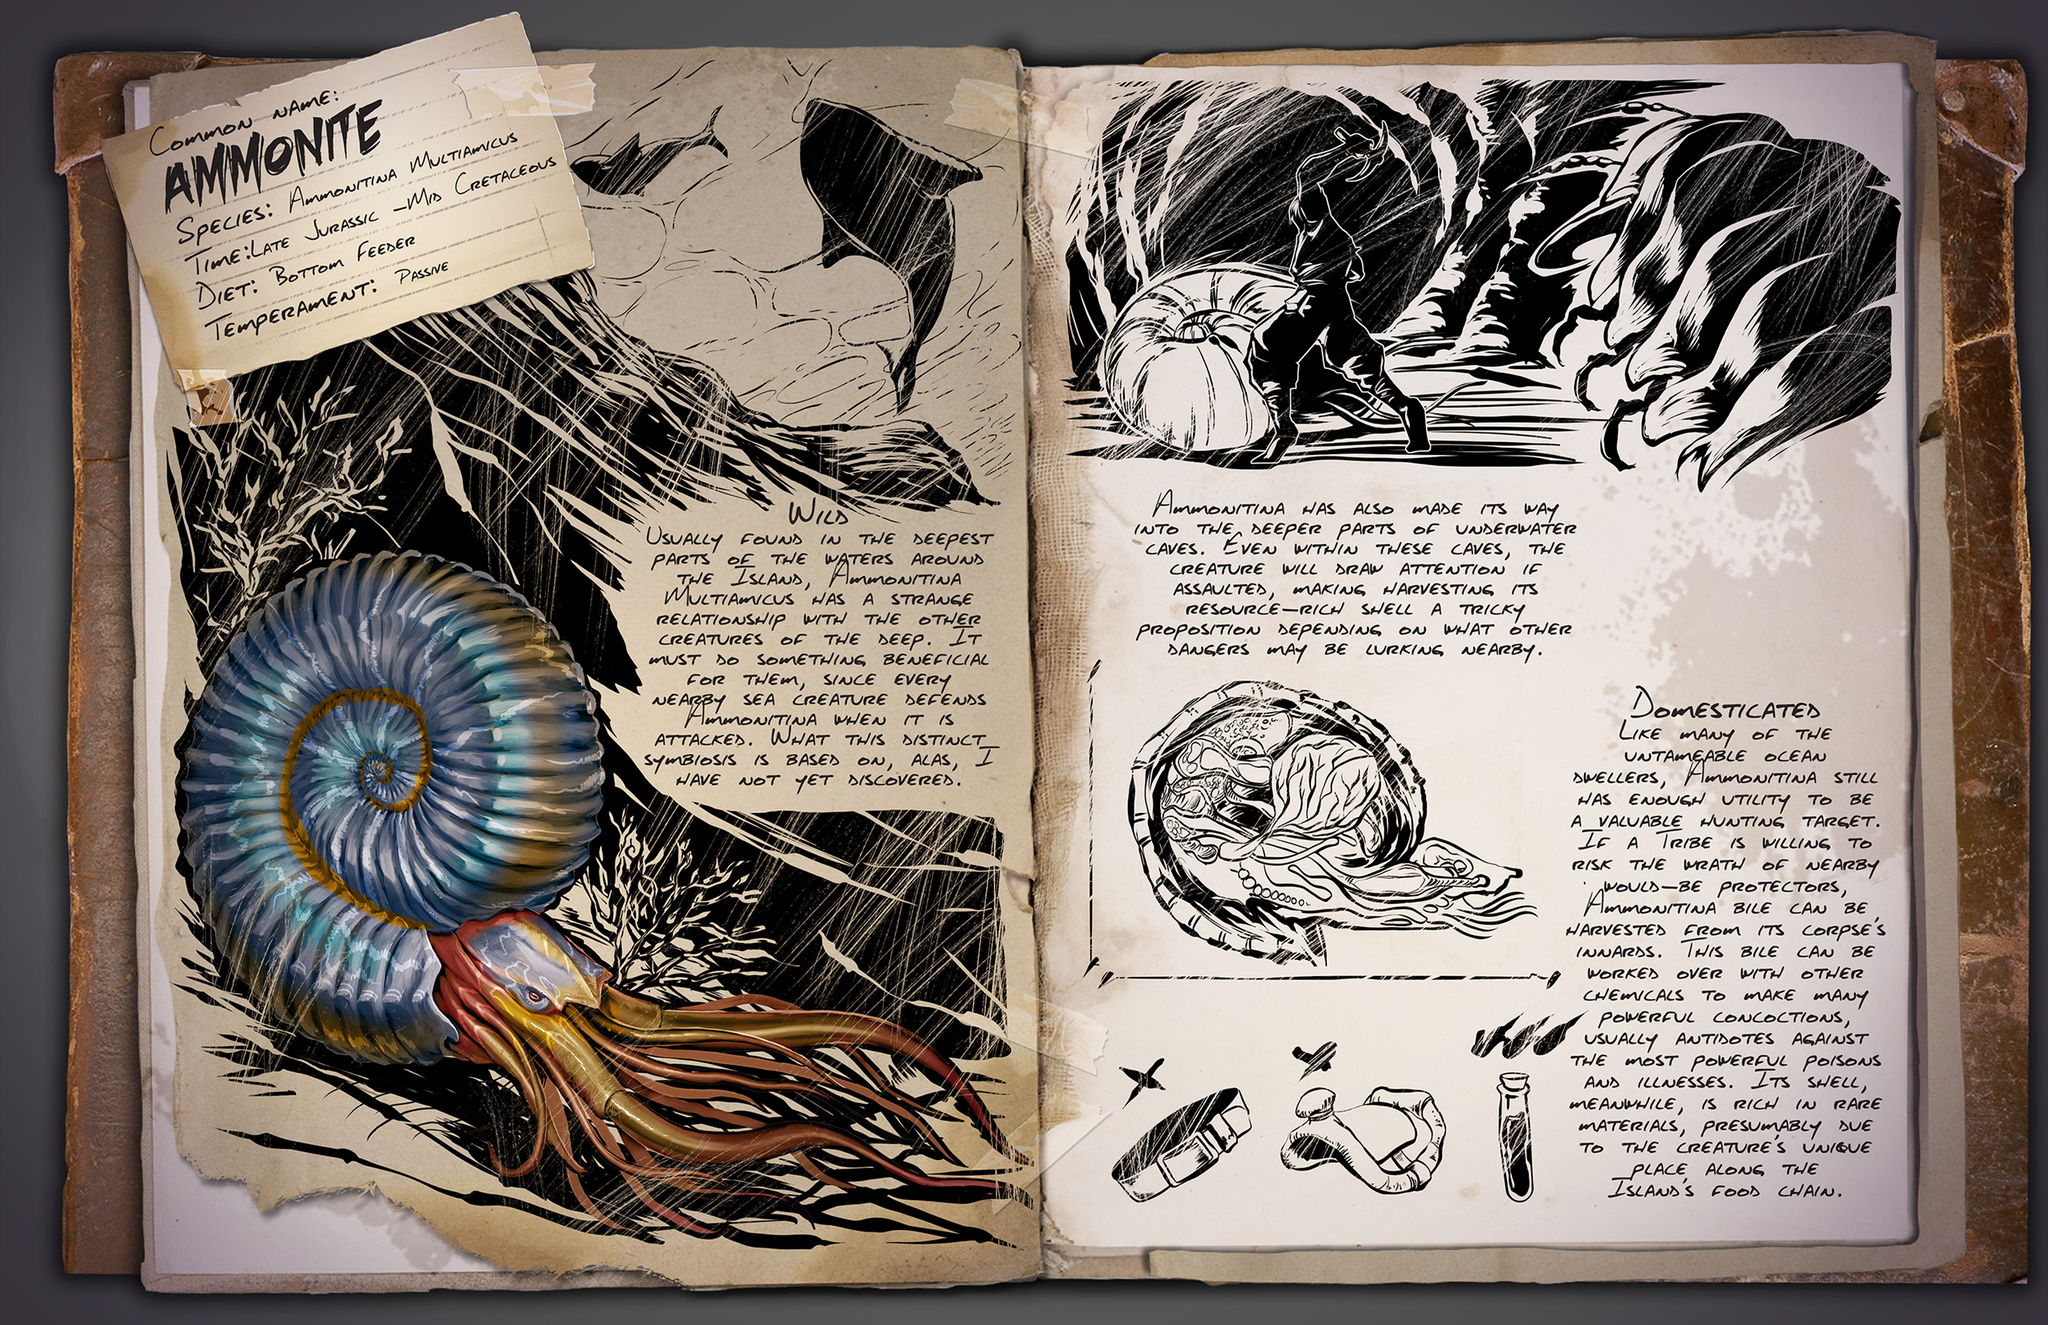 Dino Dossier: Ammonite